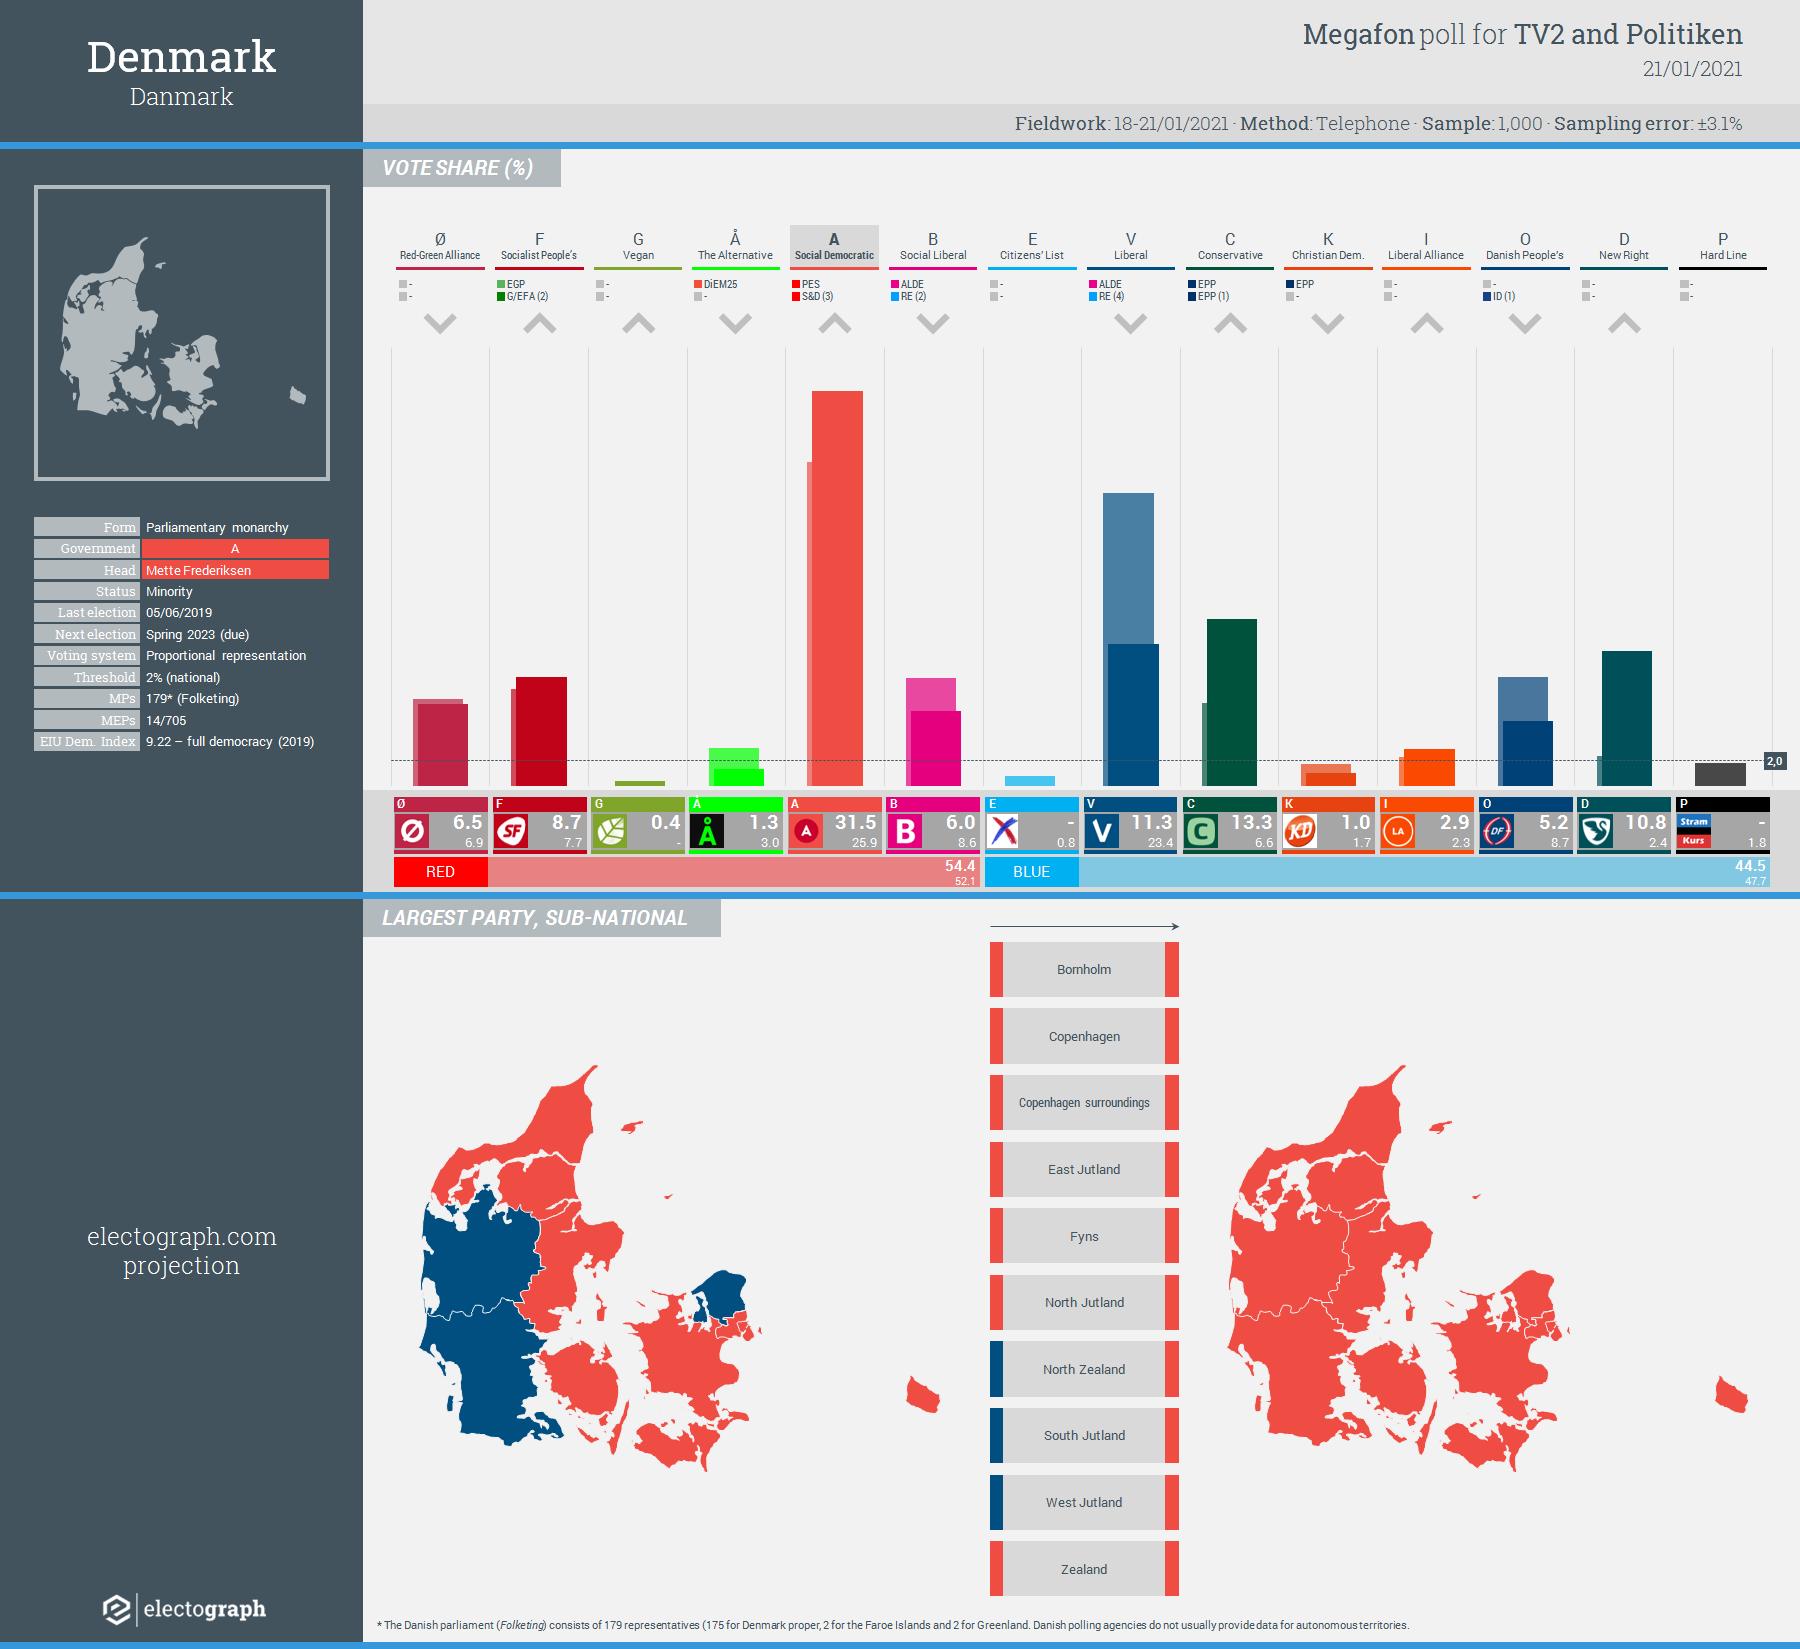 DENMARK: Megafon poll chart for TV2 and Politiken, 21 January 2021